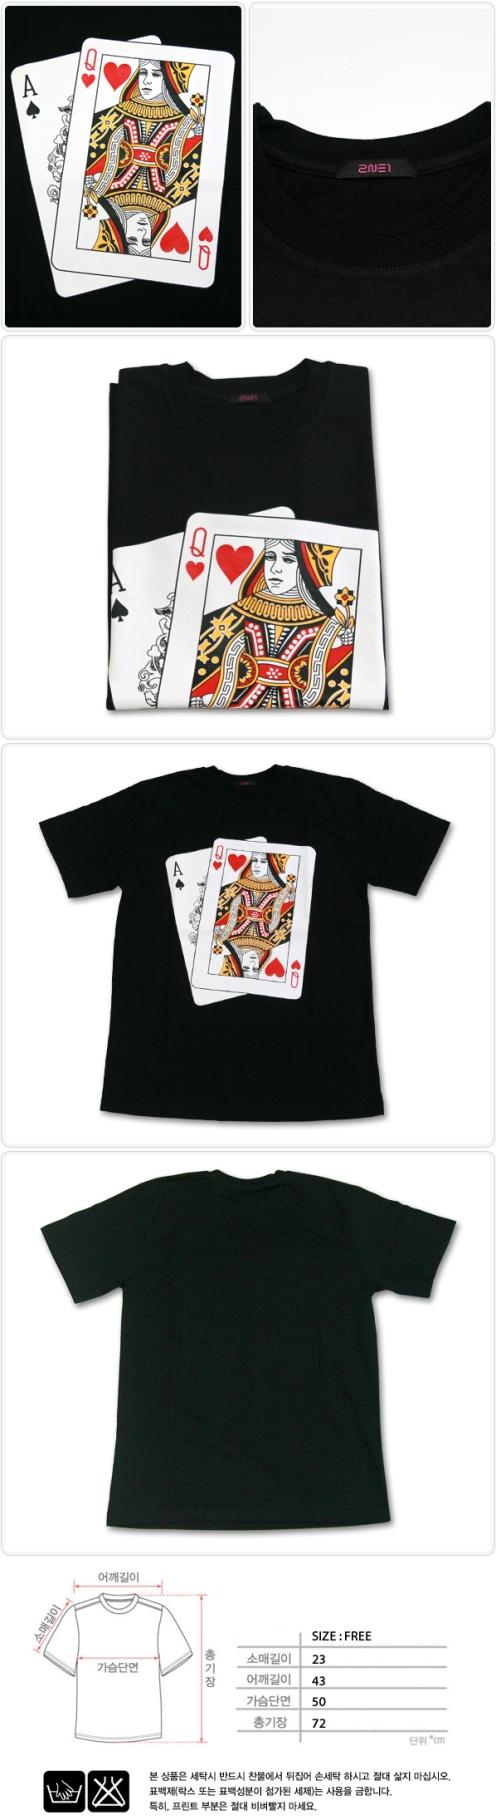 2ne1_t-shirts